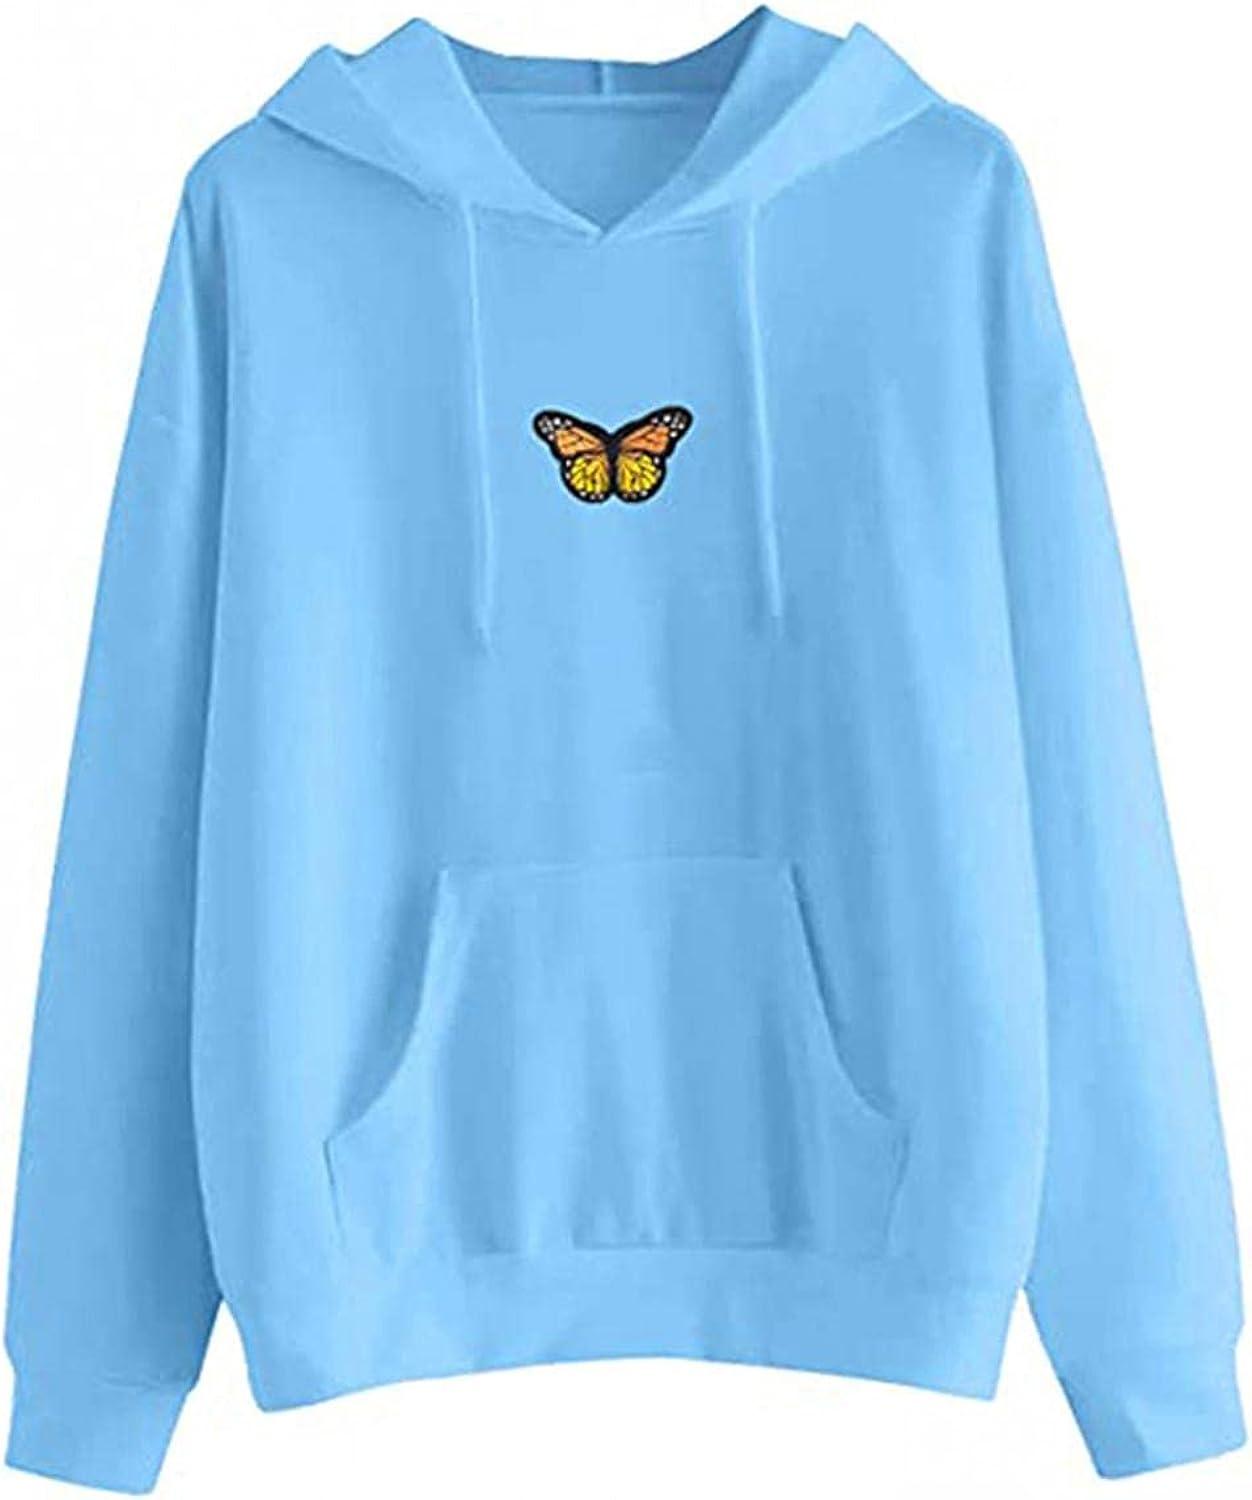 Womens Hoodies, Women Girls Fashion Frog Print Long Sleeve Hoodie Sweatshirts Loose Oversized Cute Pullover Tops